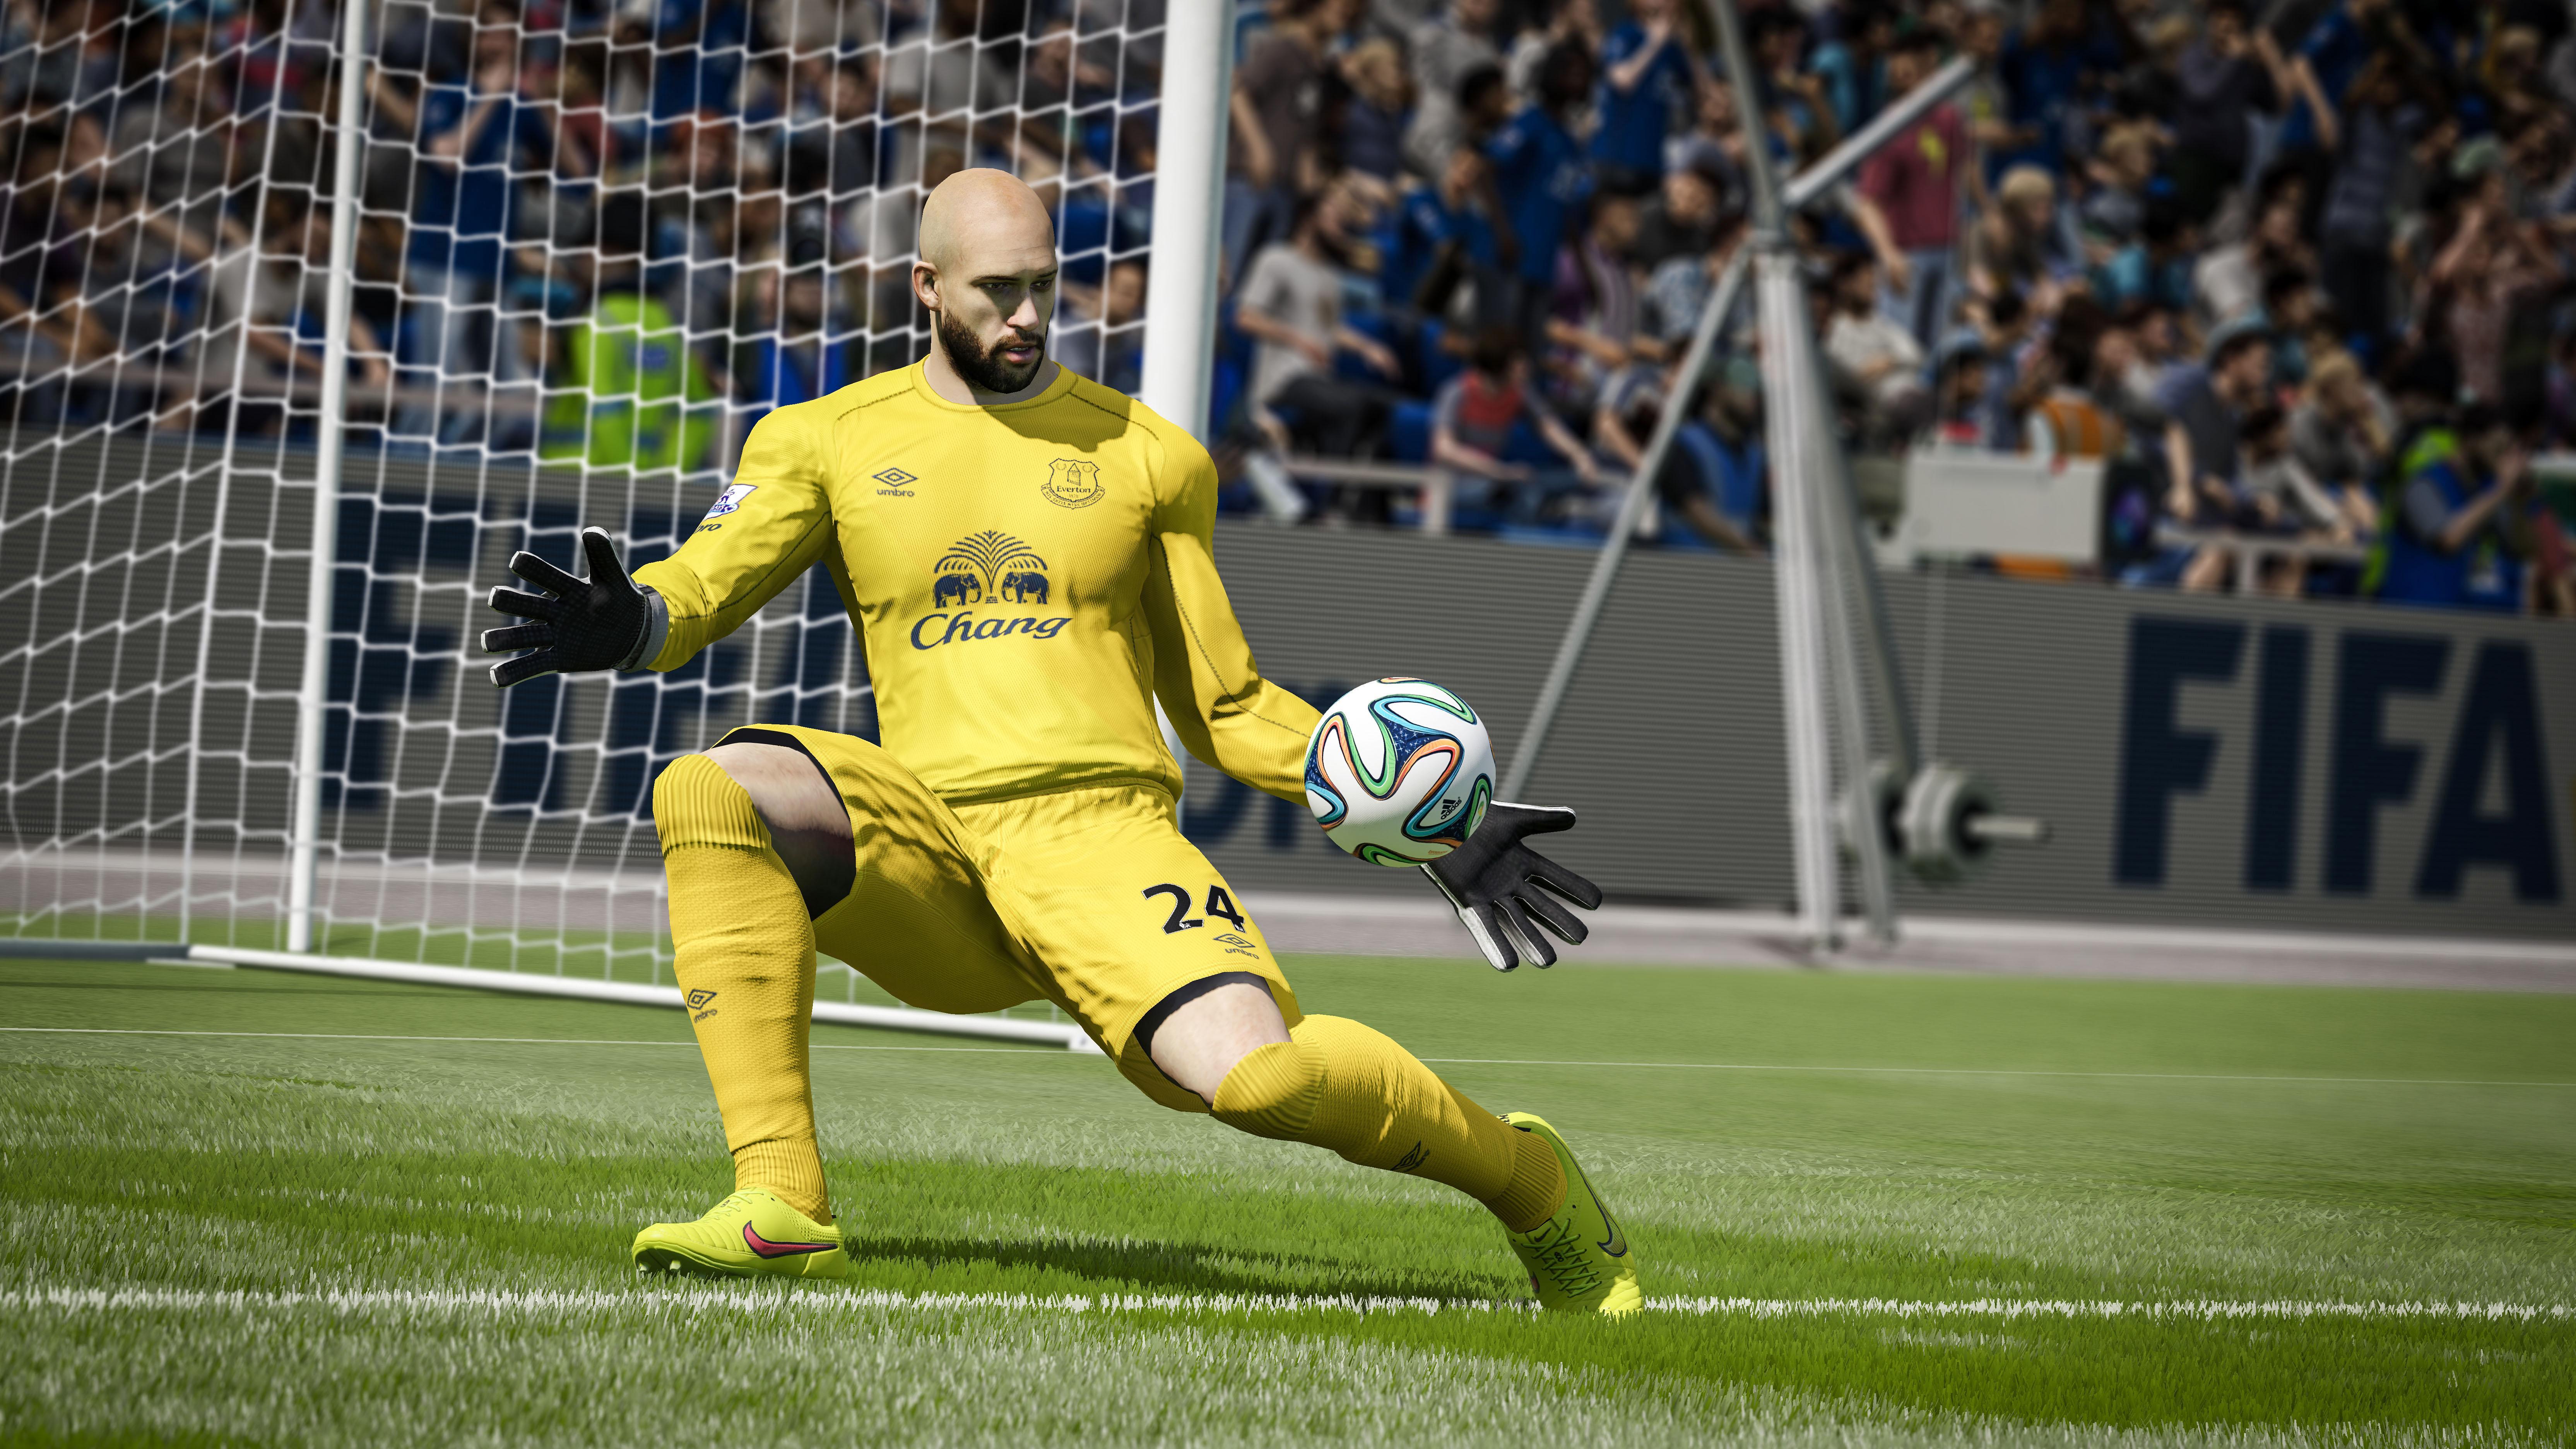 Amazon.com: FIFA 15 - PlayStation 4: Video Games